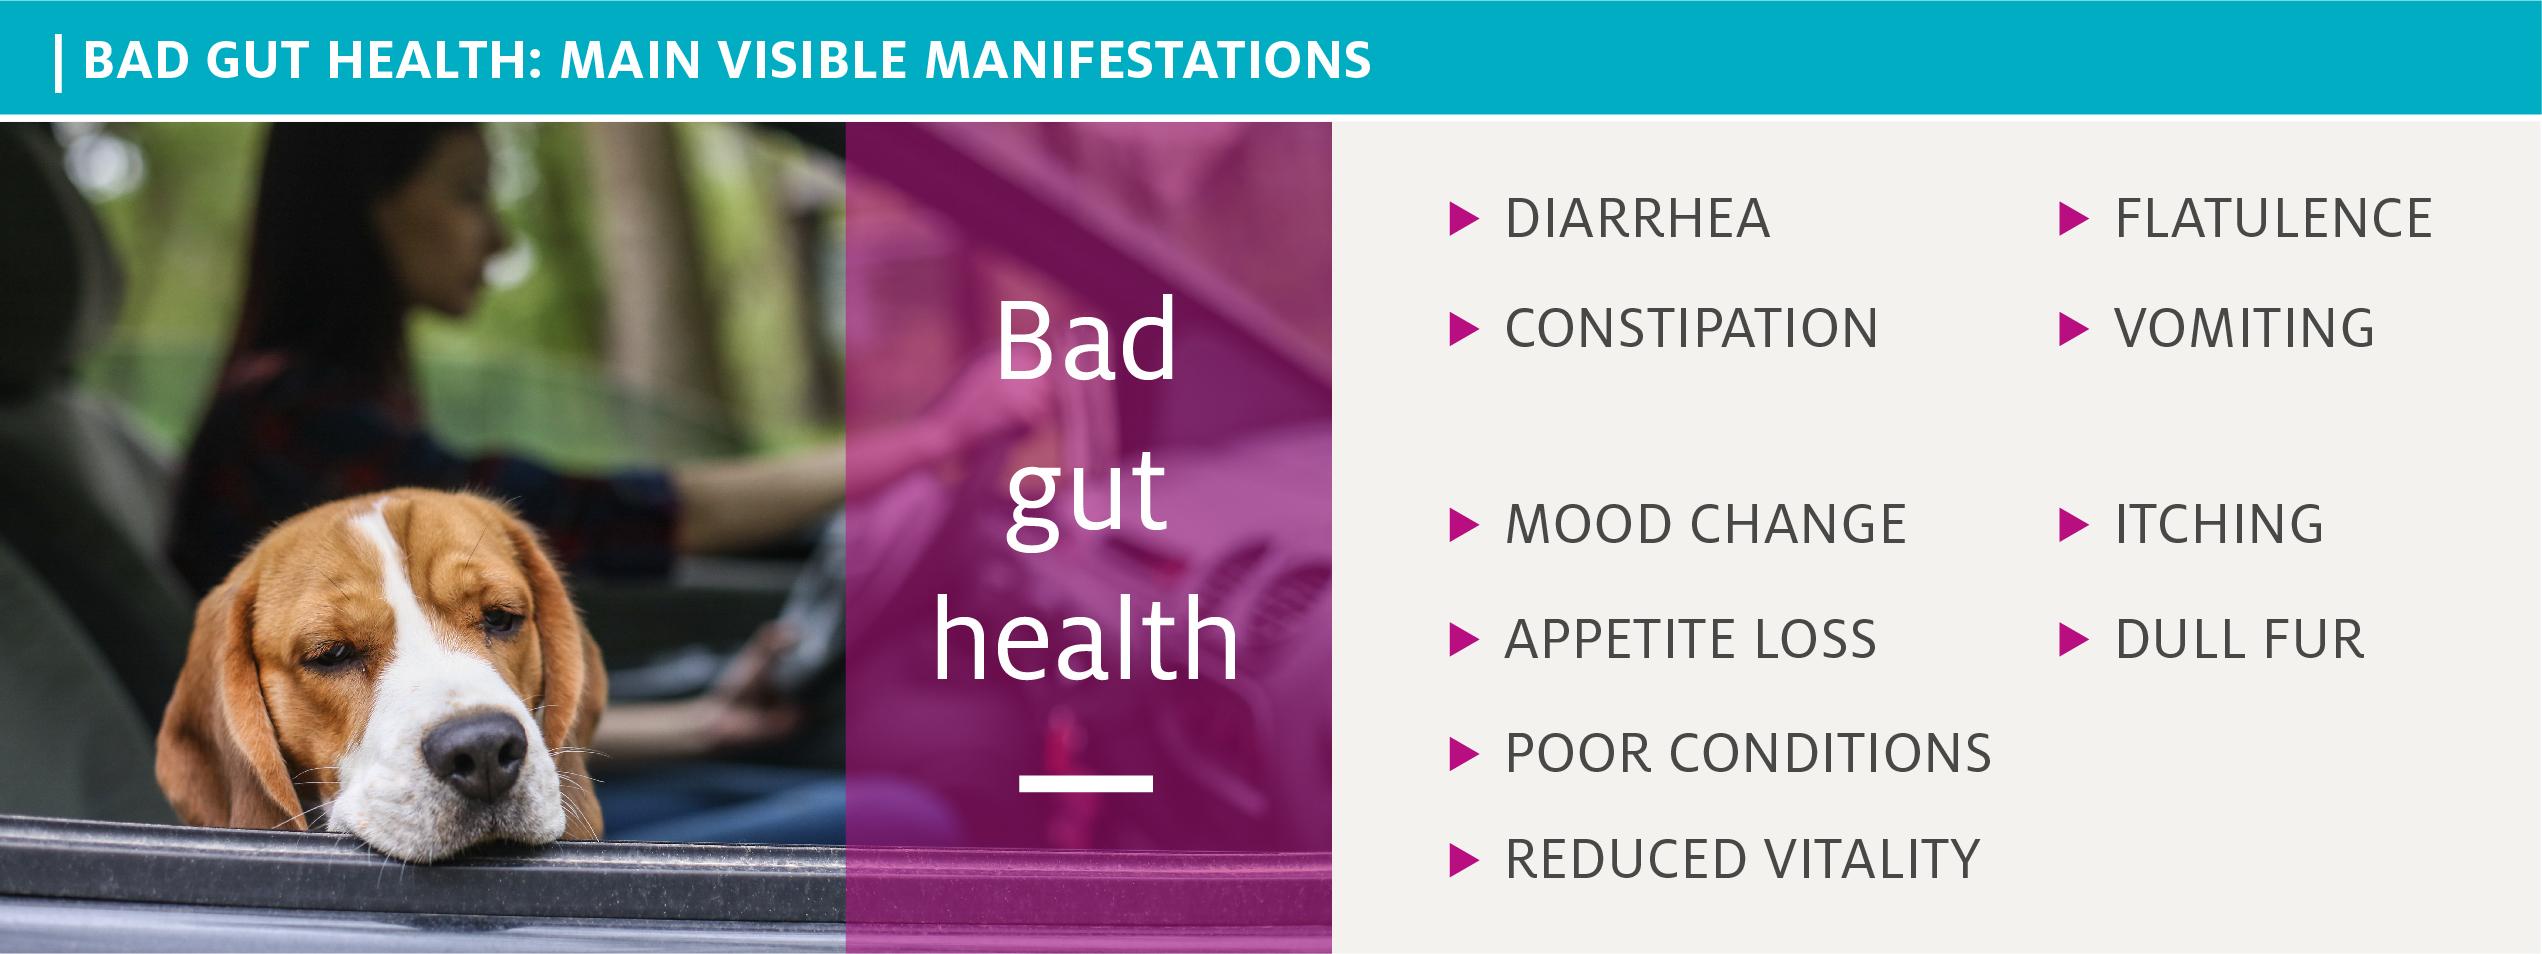 Main manifestations of bad gut health